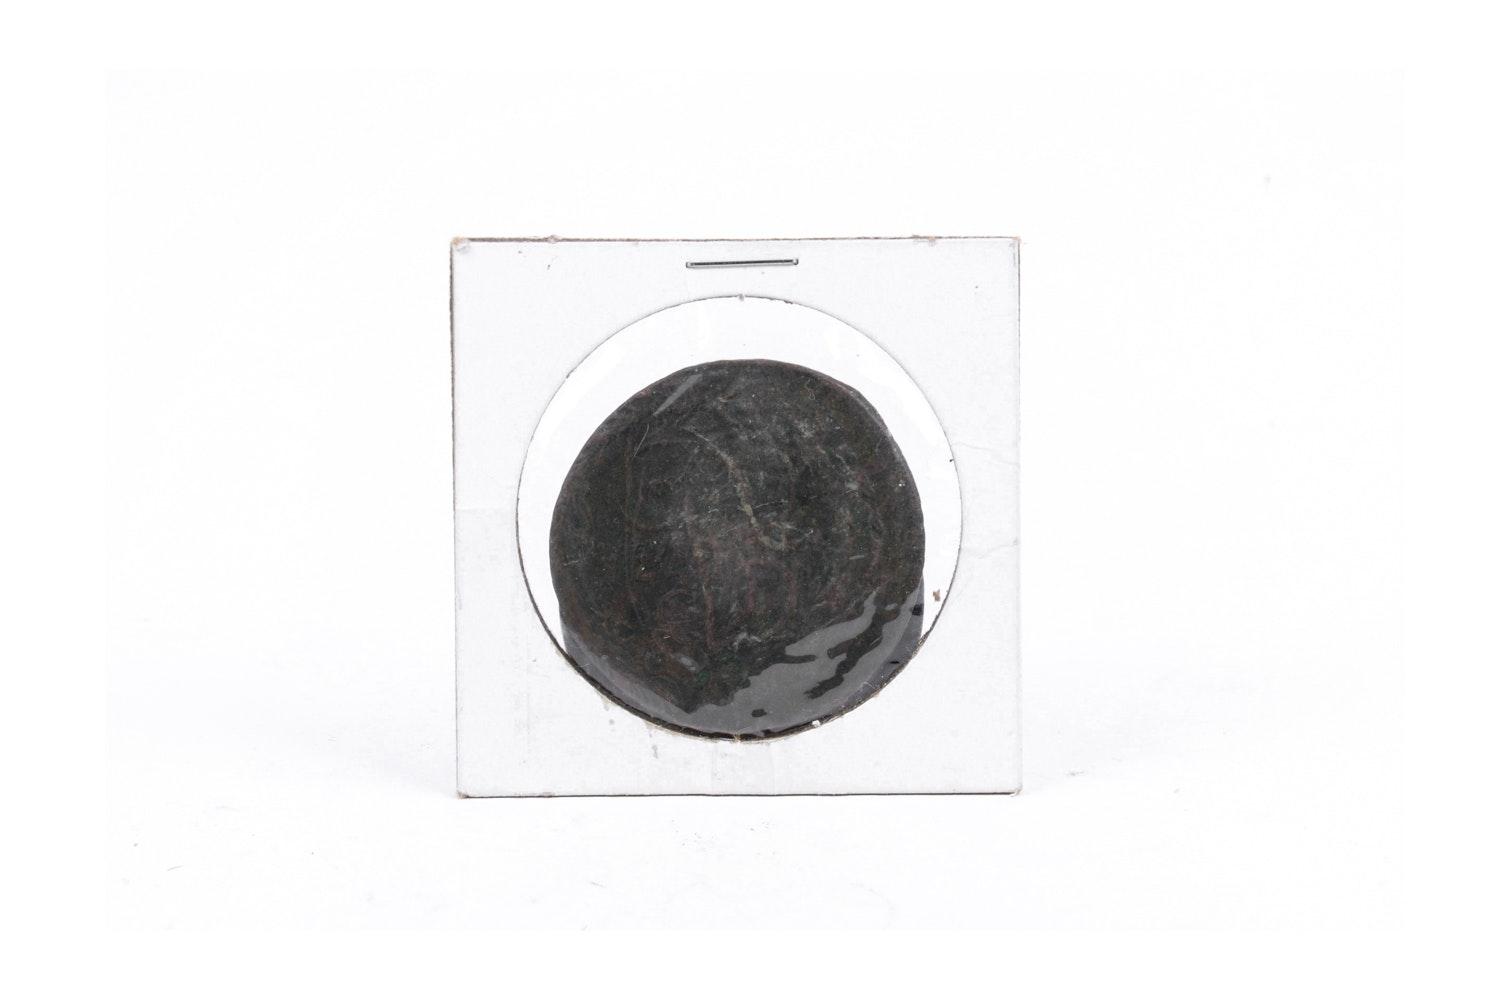 1771 Imperial Russian 5-Kopek Coin